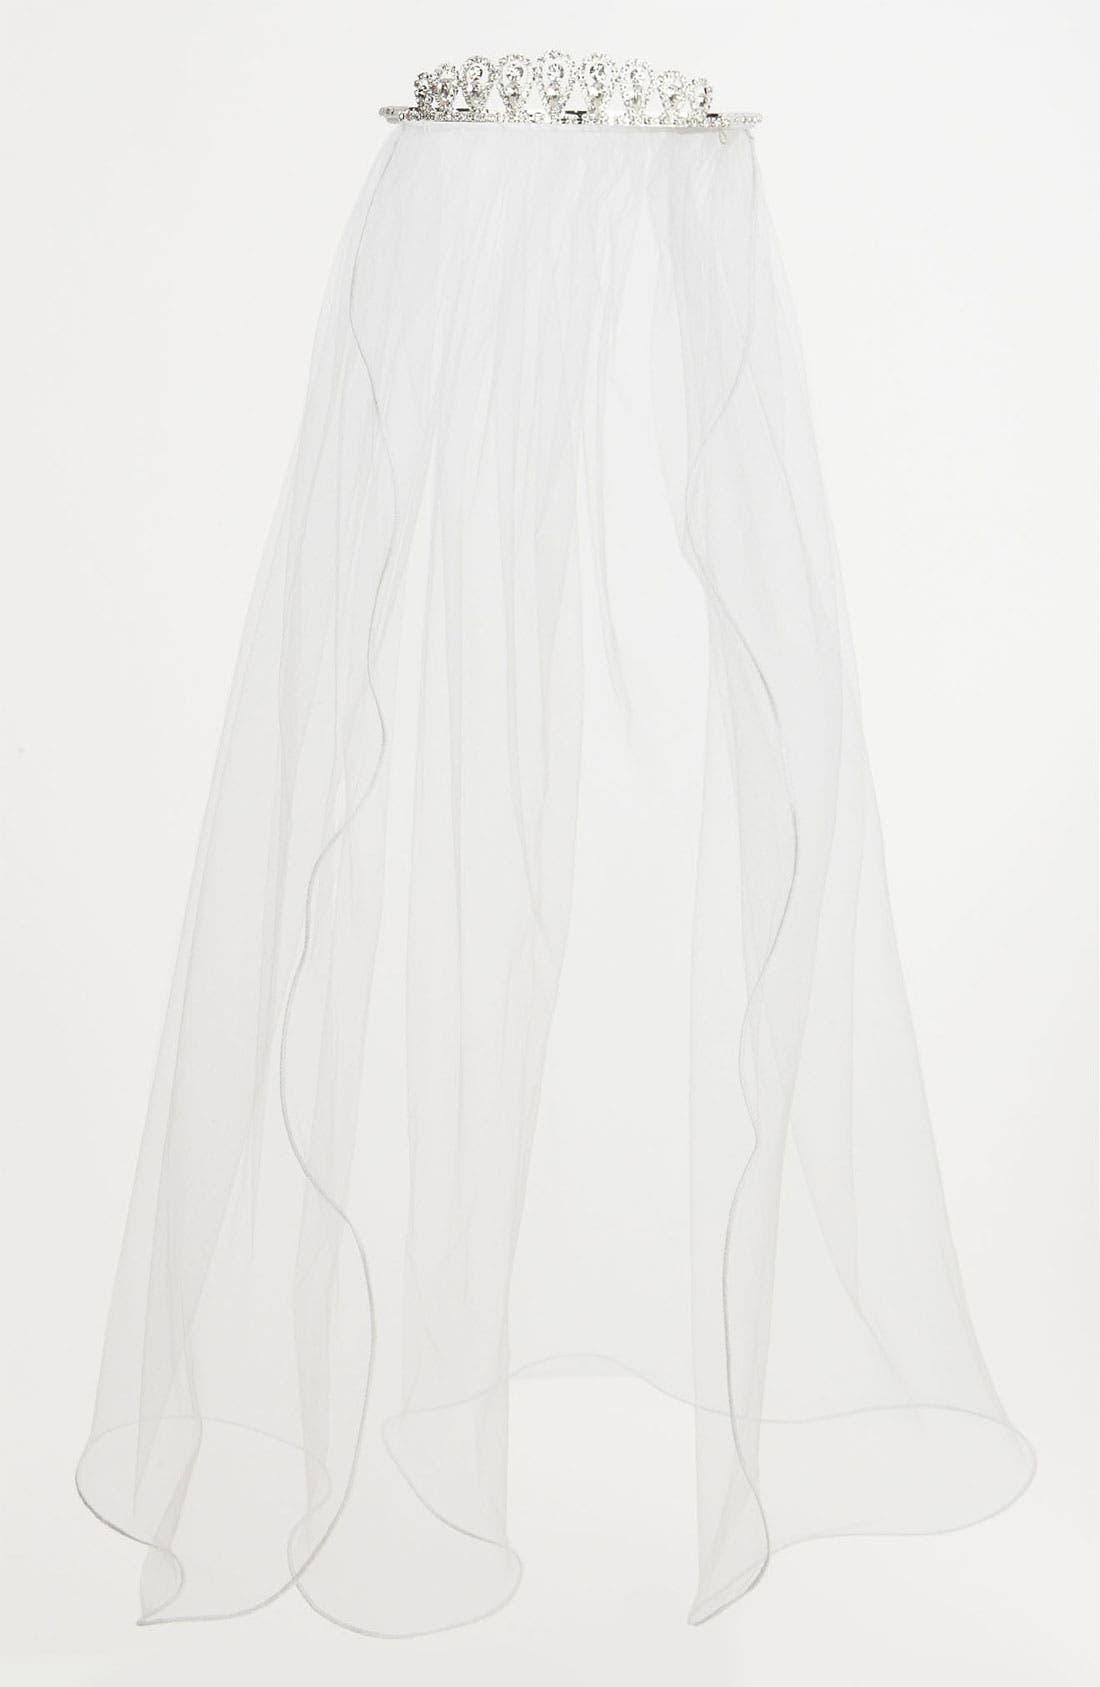 Alternate Image 1 Selected - Adriana Cupelli Rhinestone Tiara Veil (Girls)